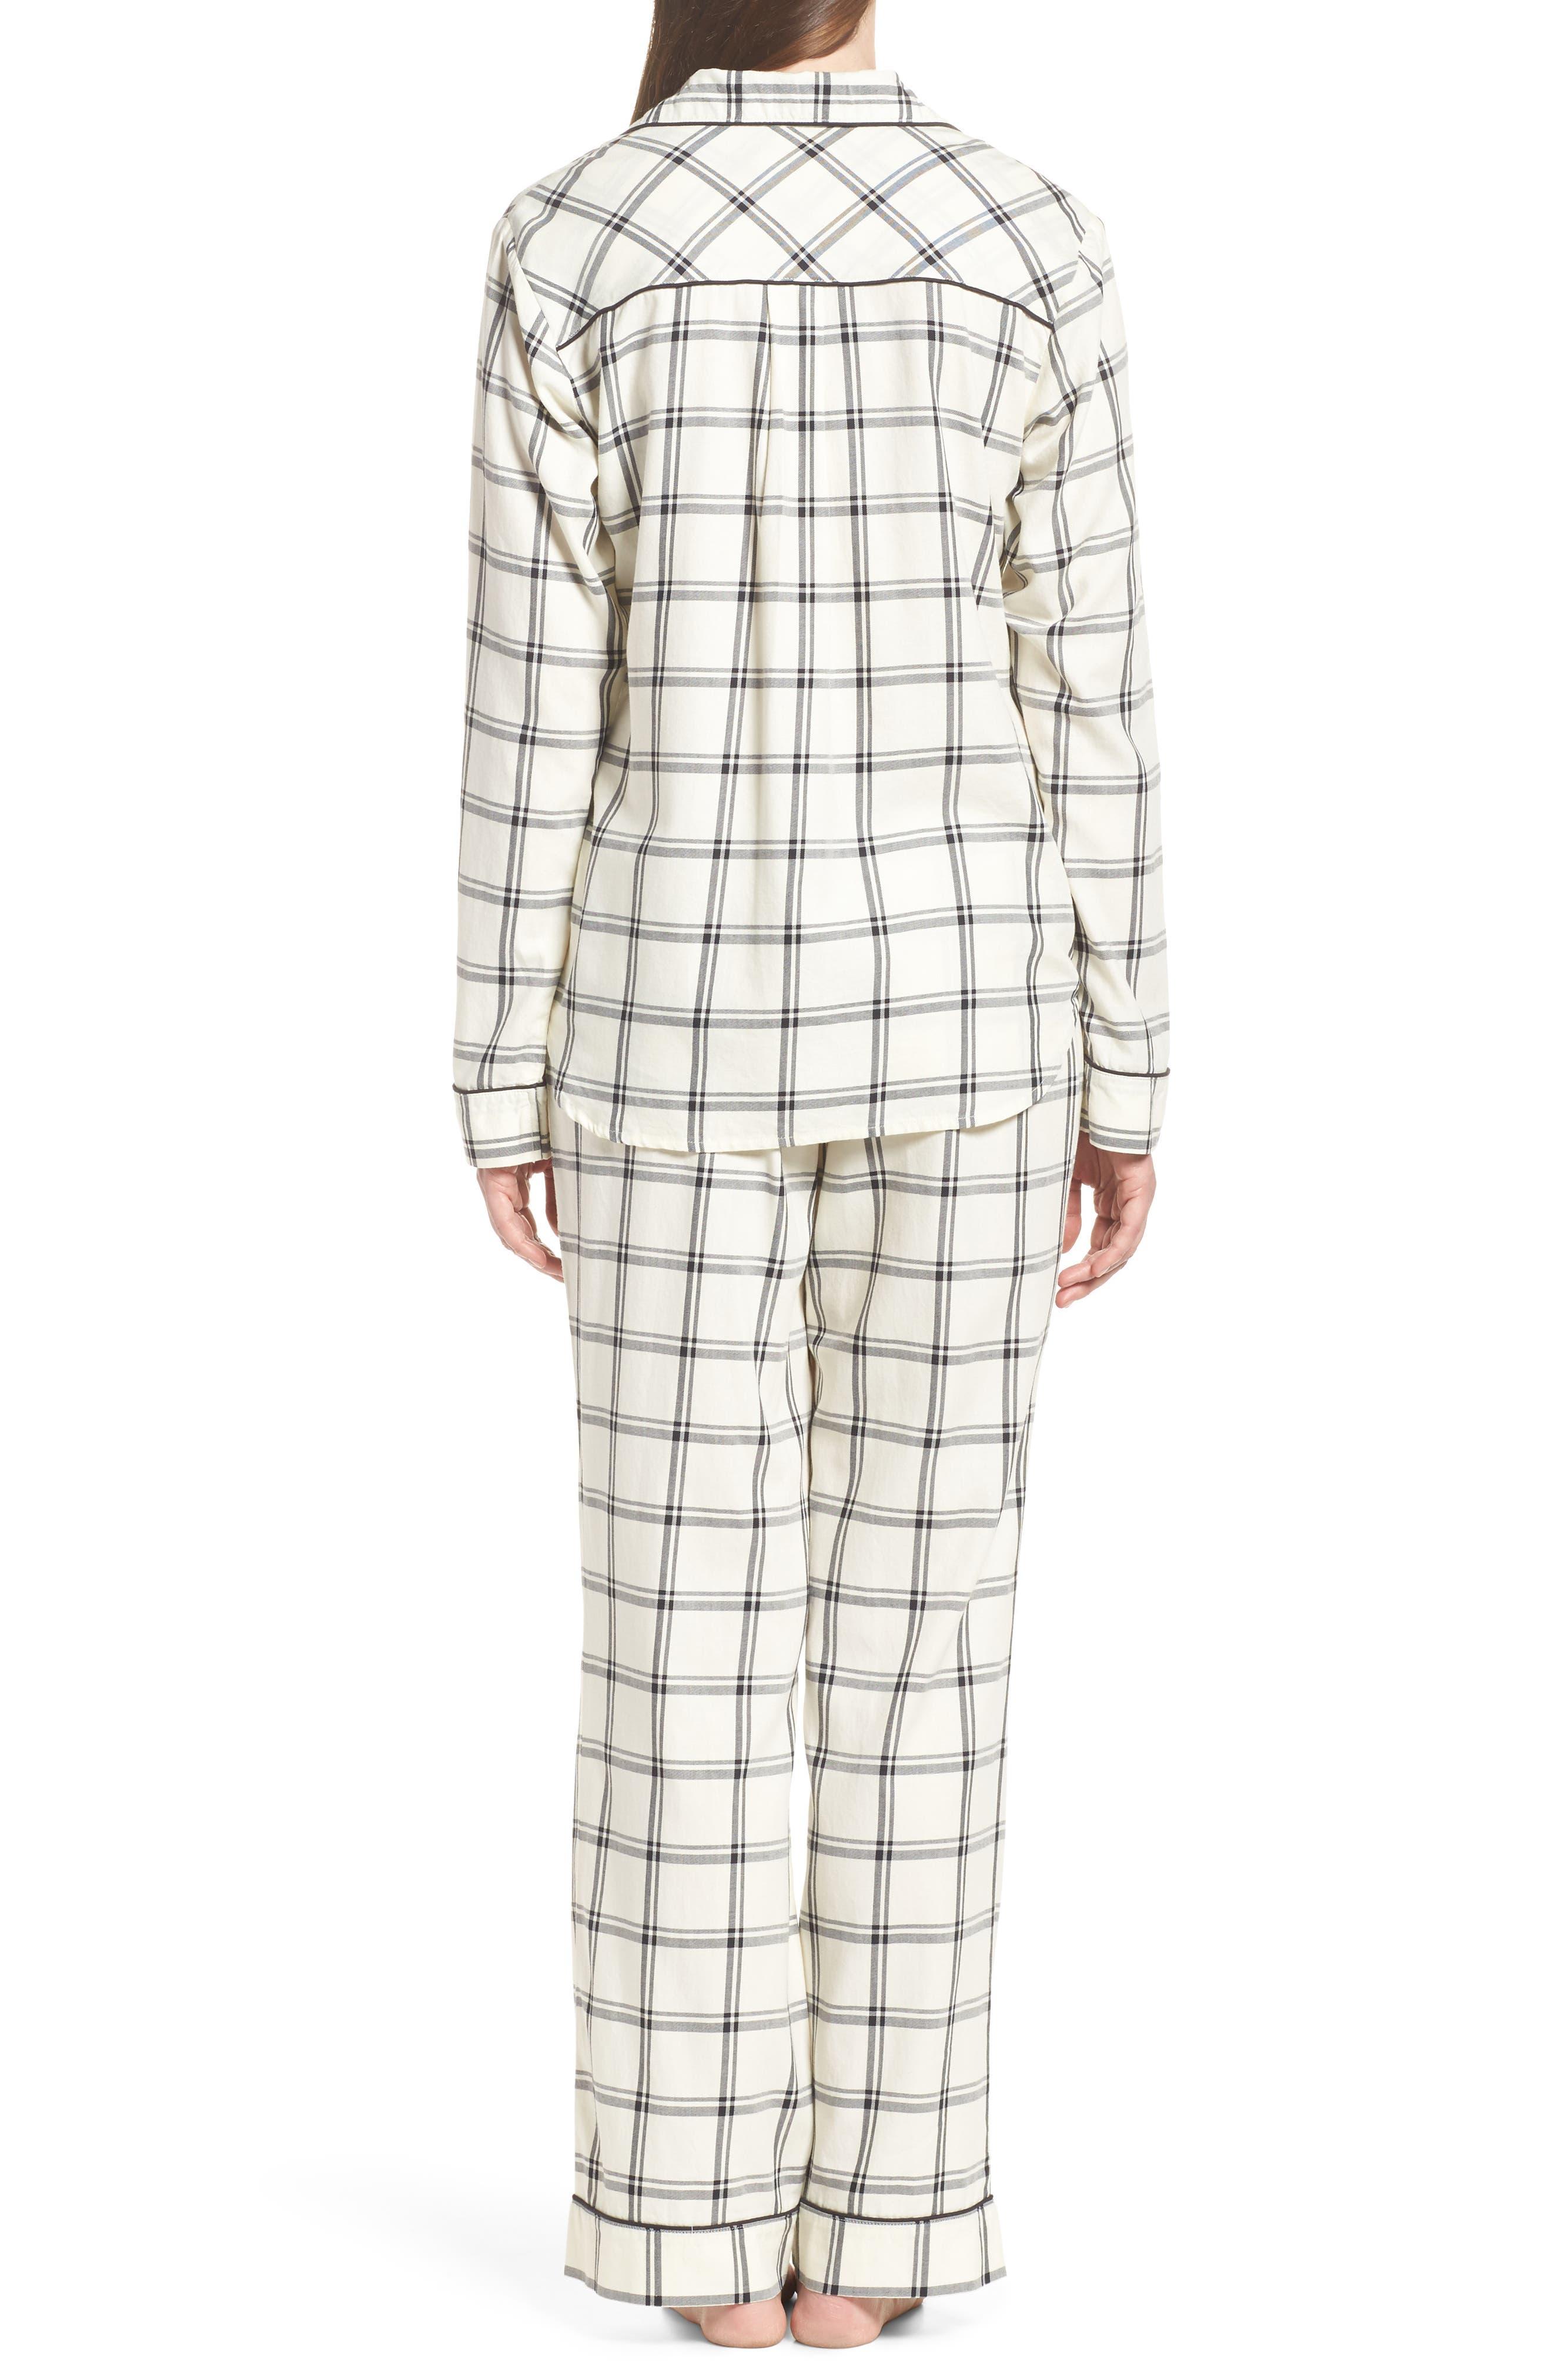 Raven Plaid Pajamas,                             Alternate thumbnail 2, color,                             Cream/ Black